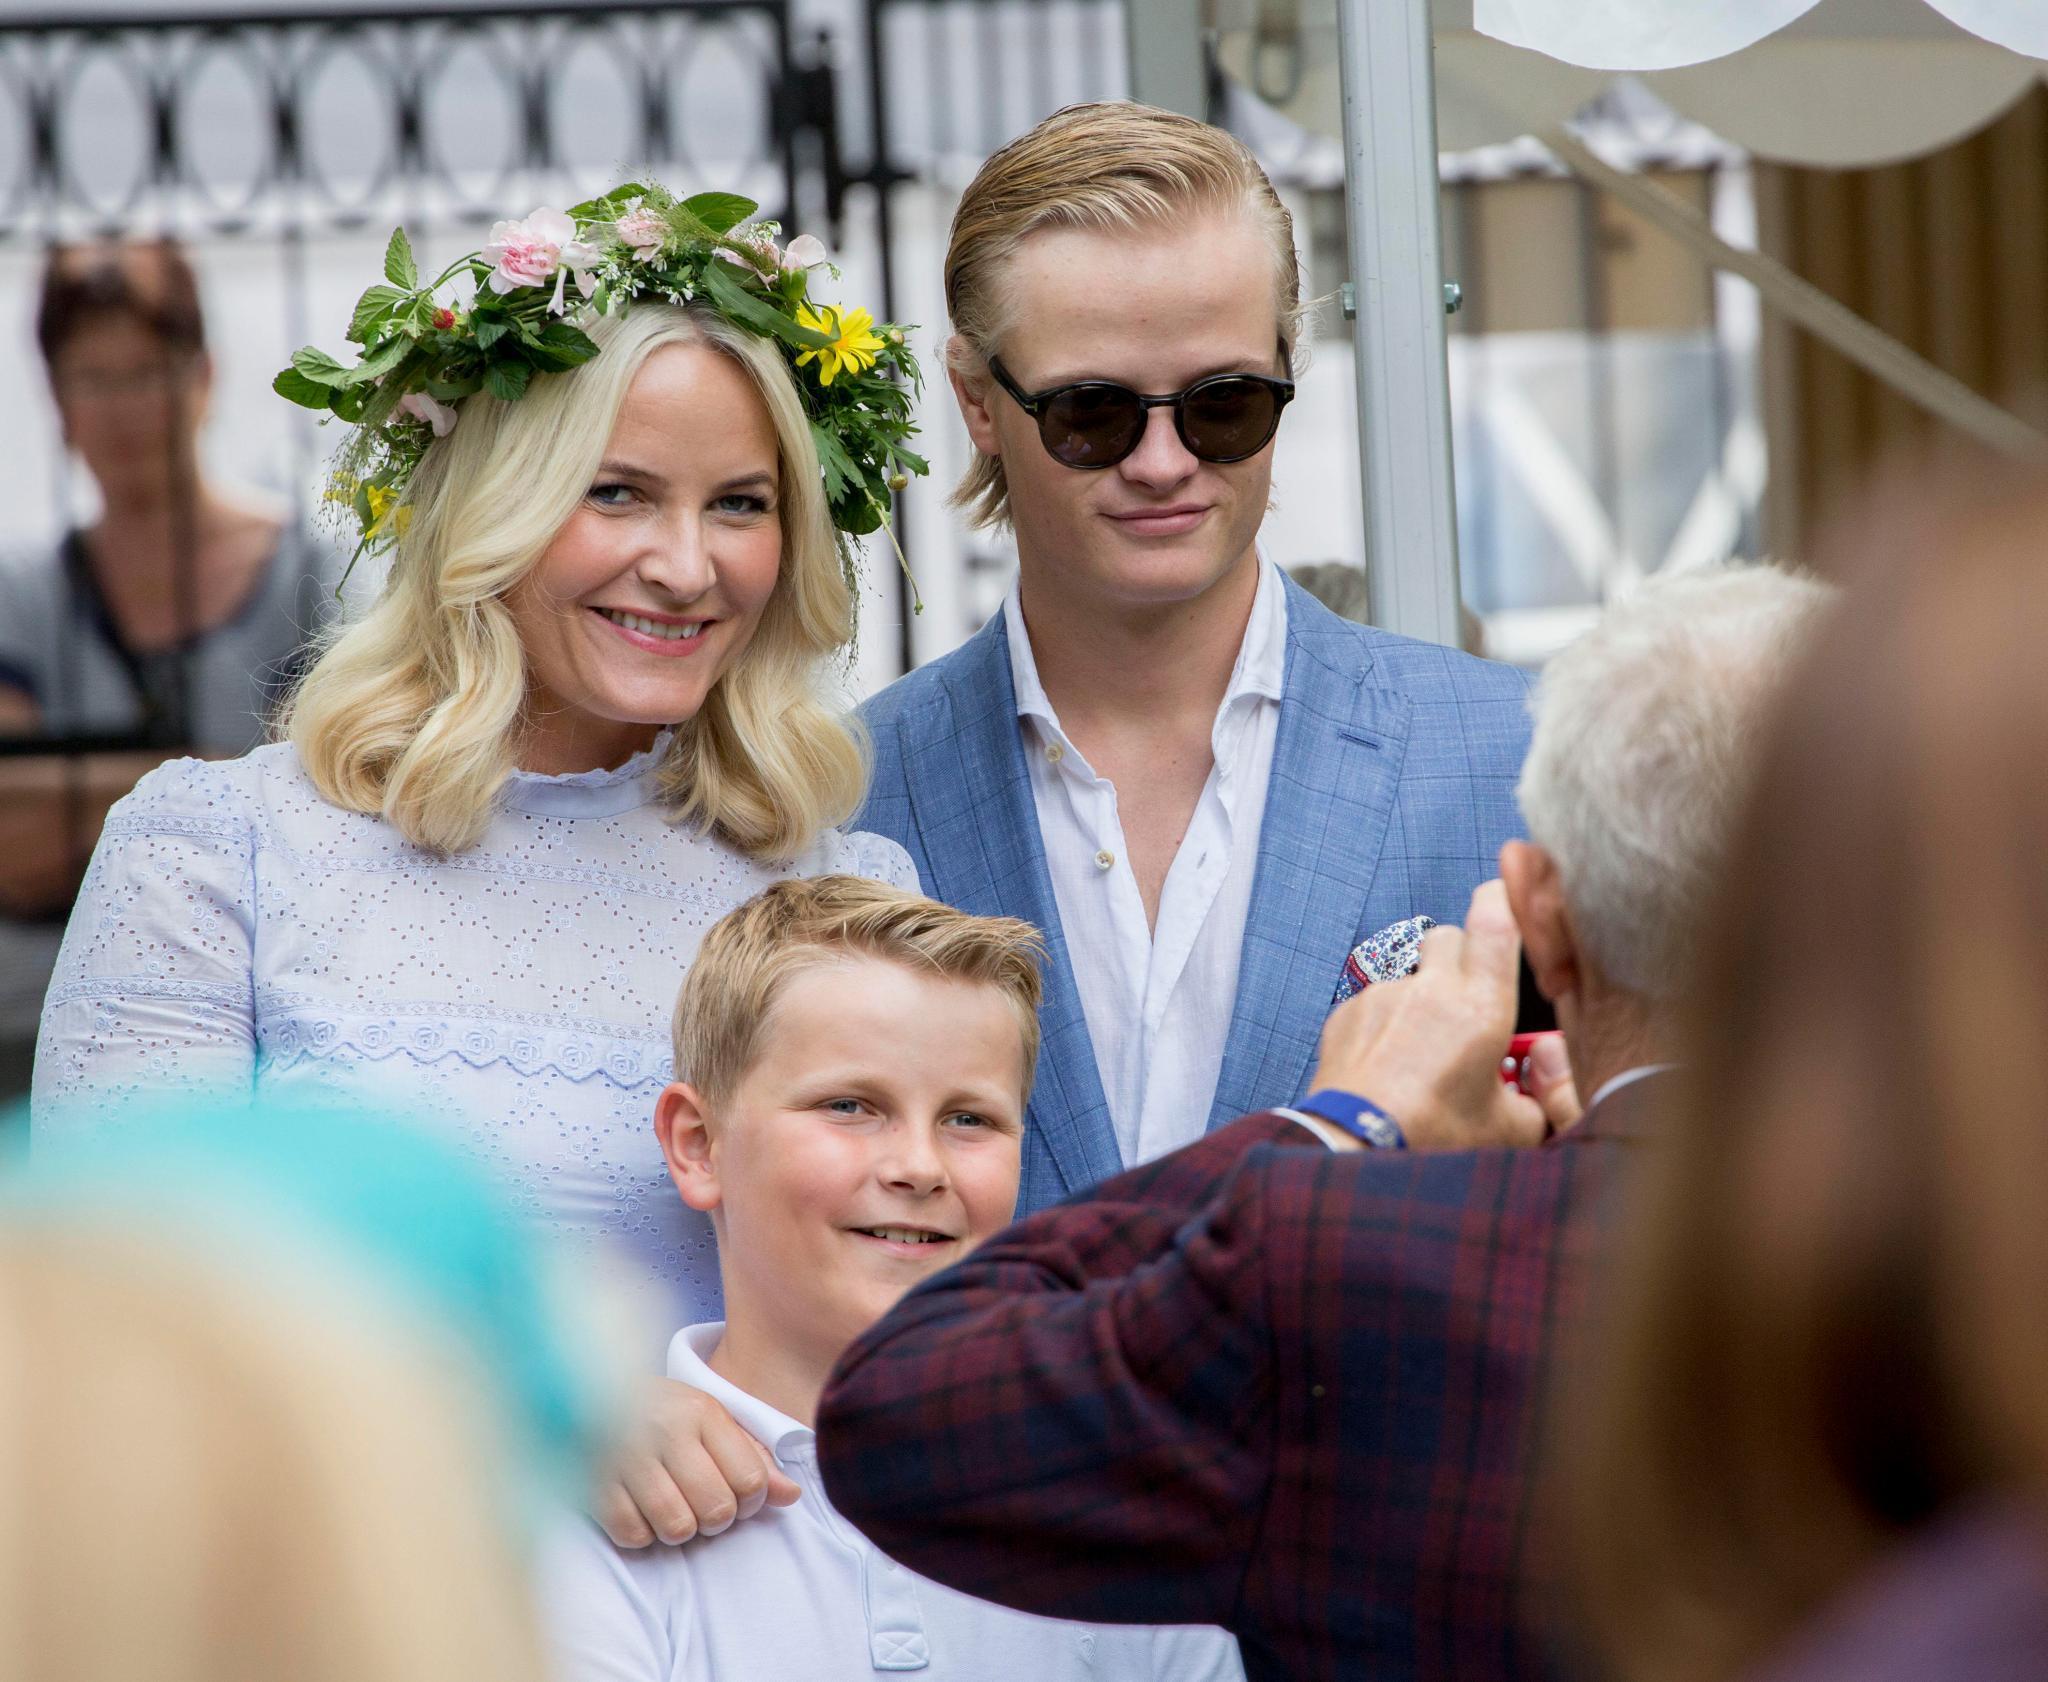 Prinzessin Mette-Marit, Marius Borg Høiby